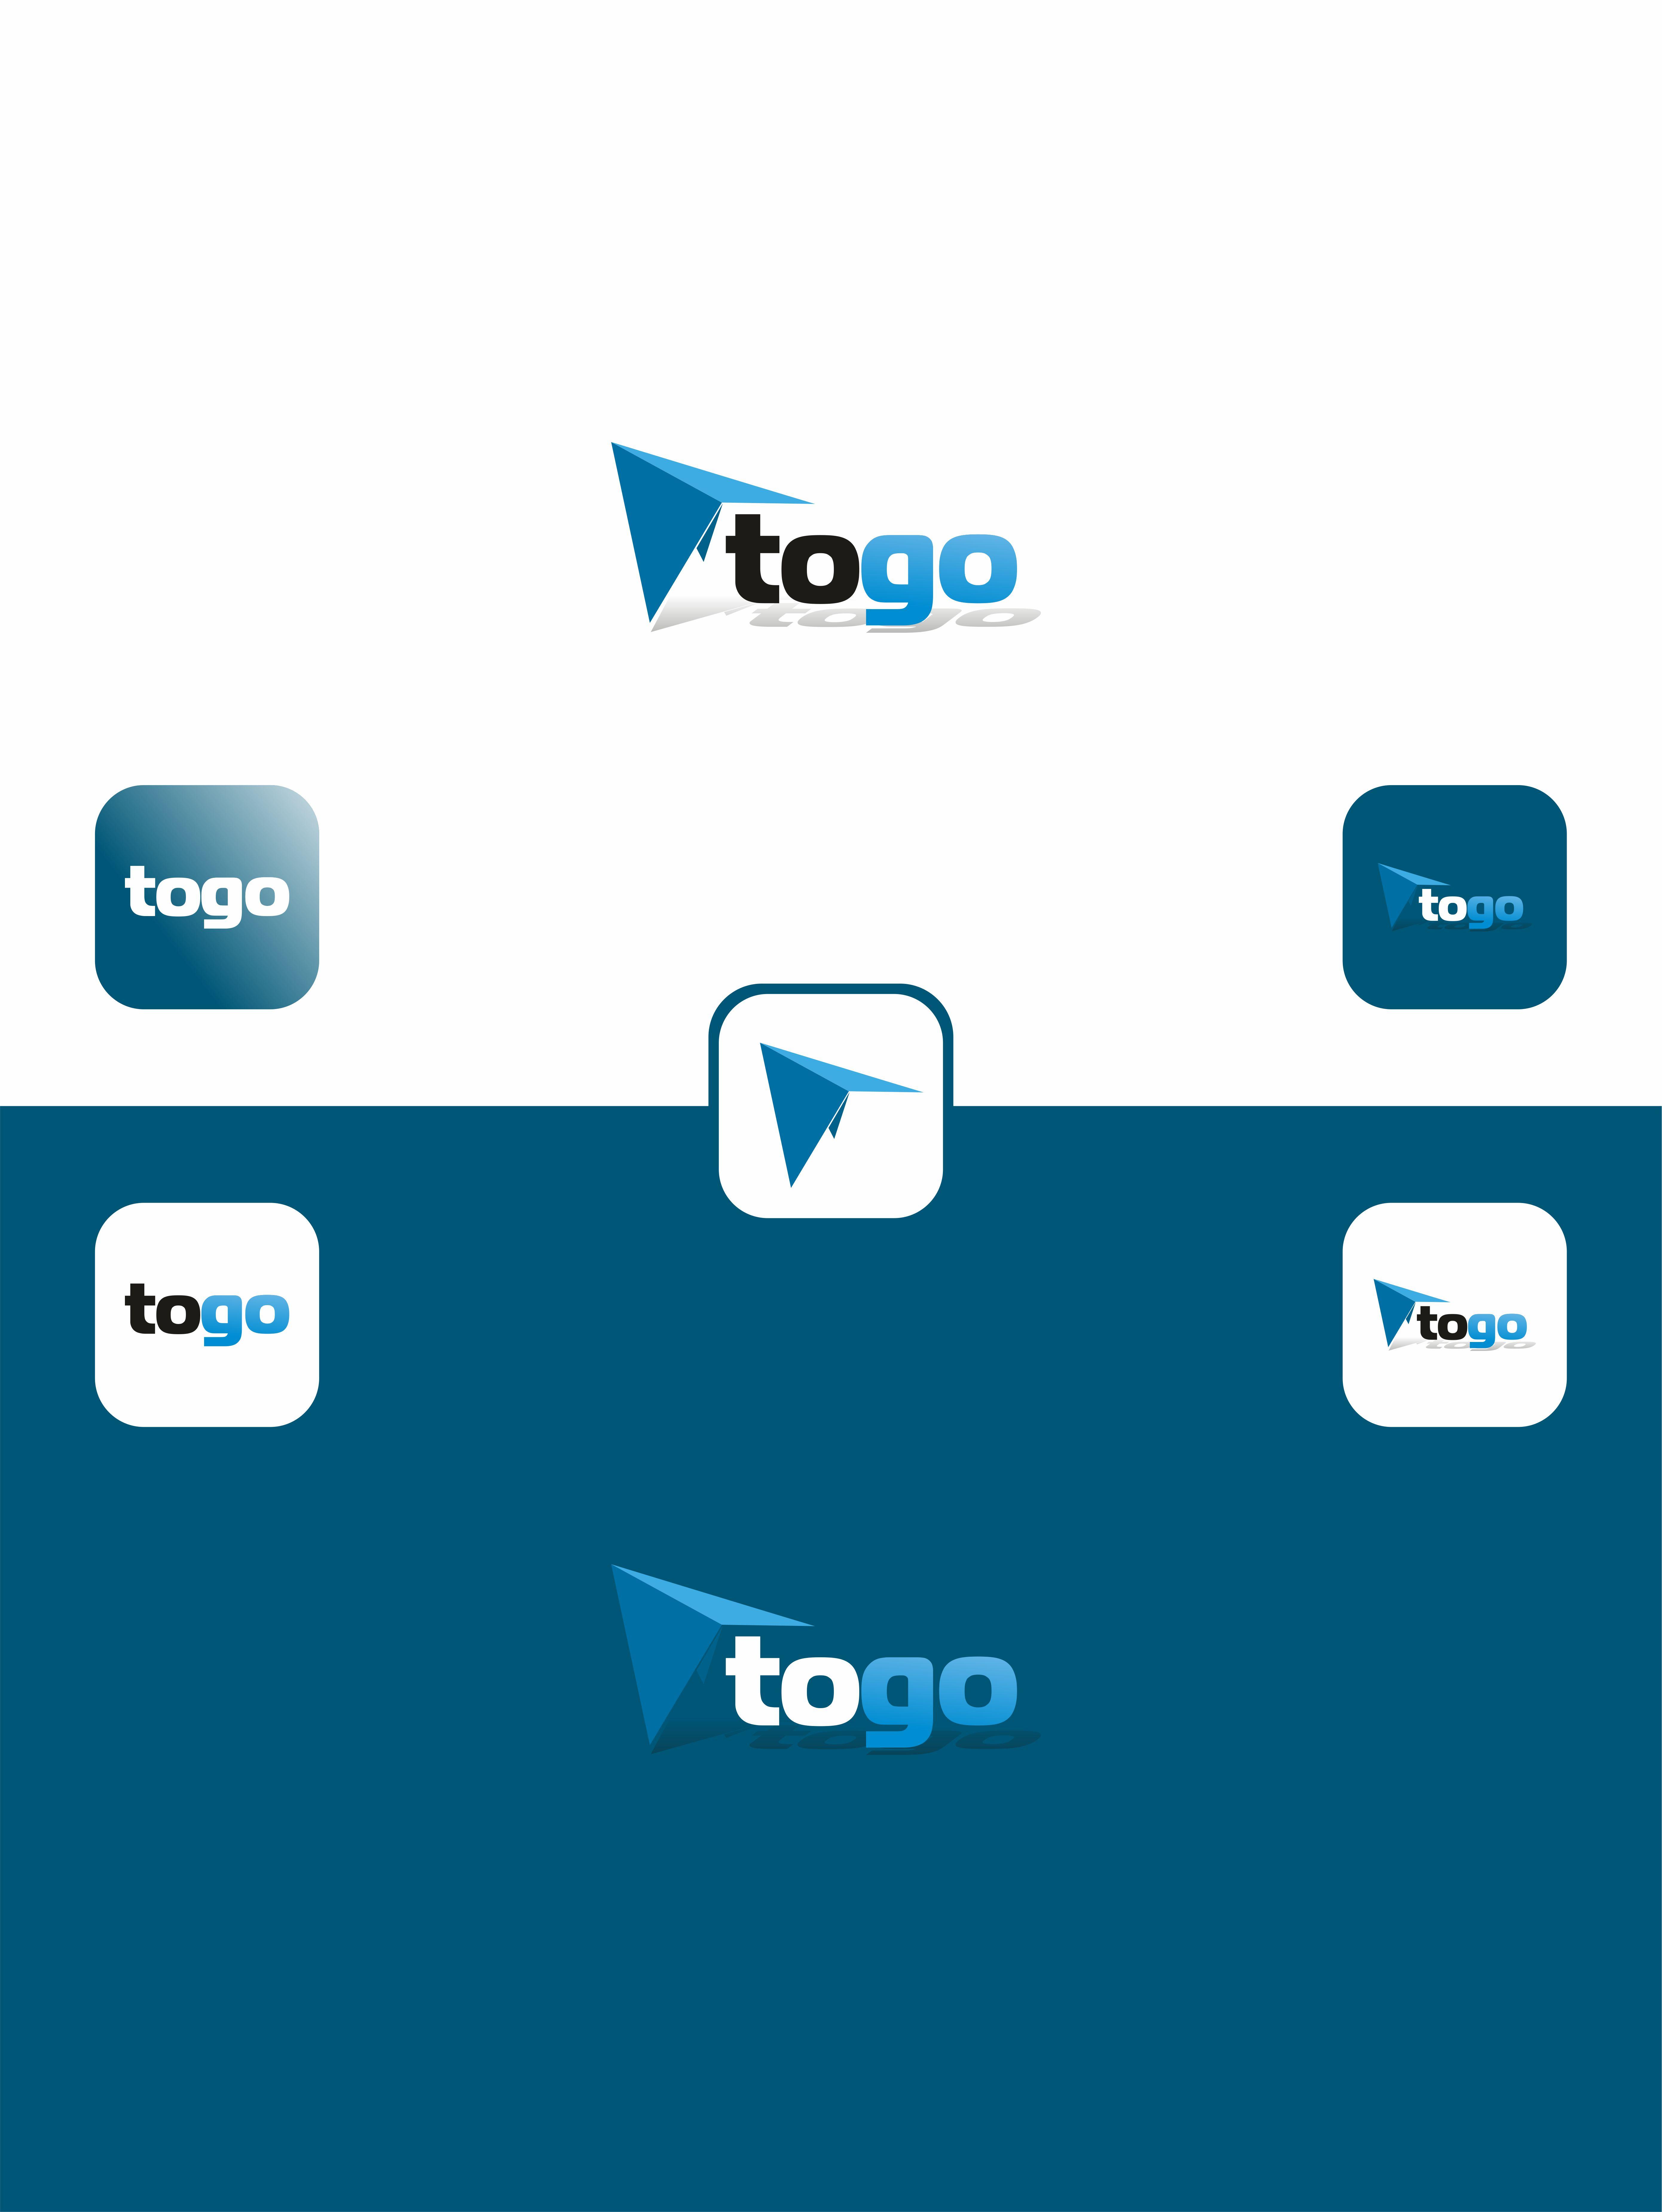 Разработать логотип и экран загрузки приложения фото f_2305a86d6727c7b9.jpg